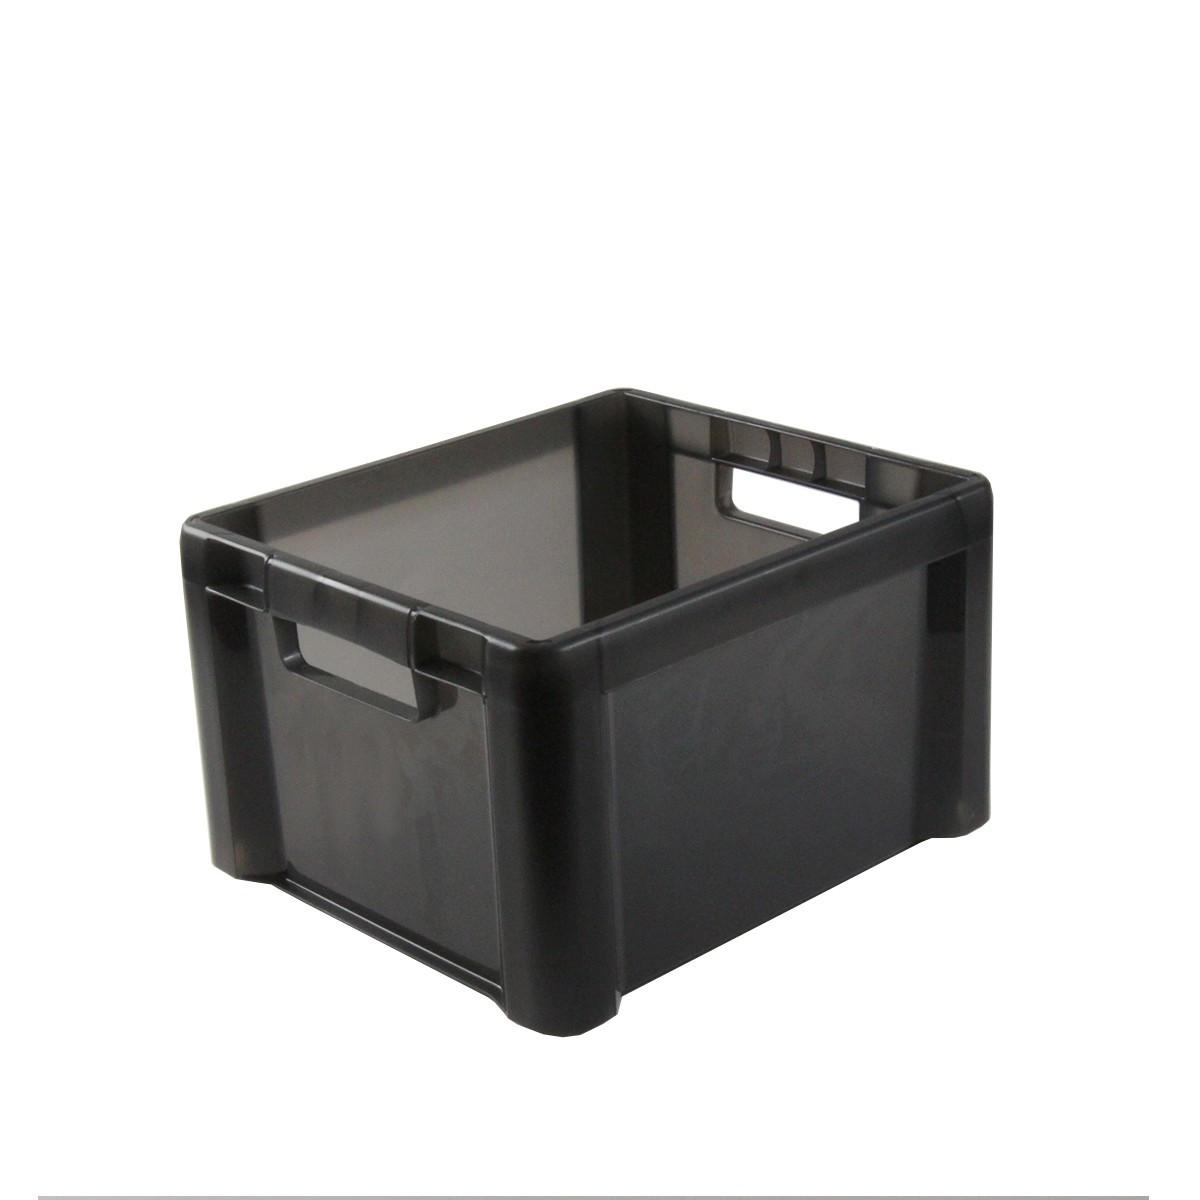 caisse empilable en plastique gris 28 litres. Black Bedroom Furniture Sets. Home Design Ideas